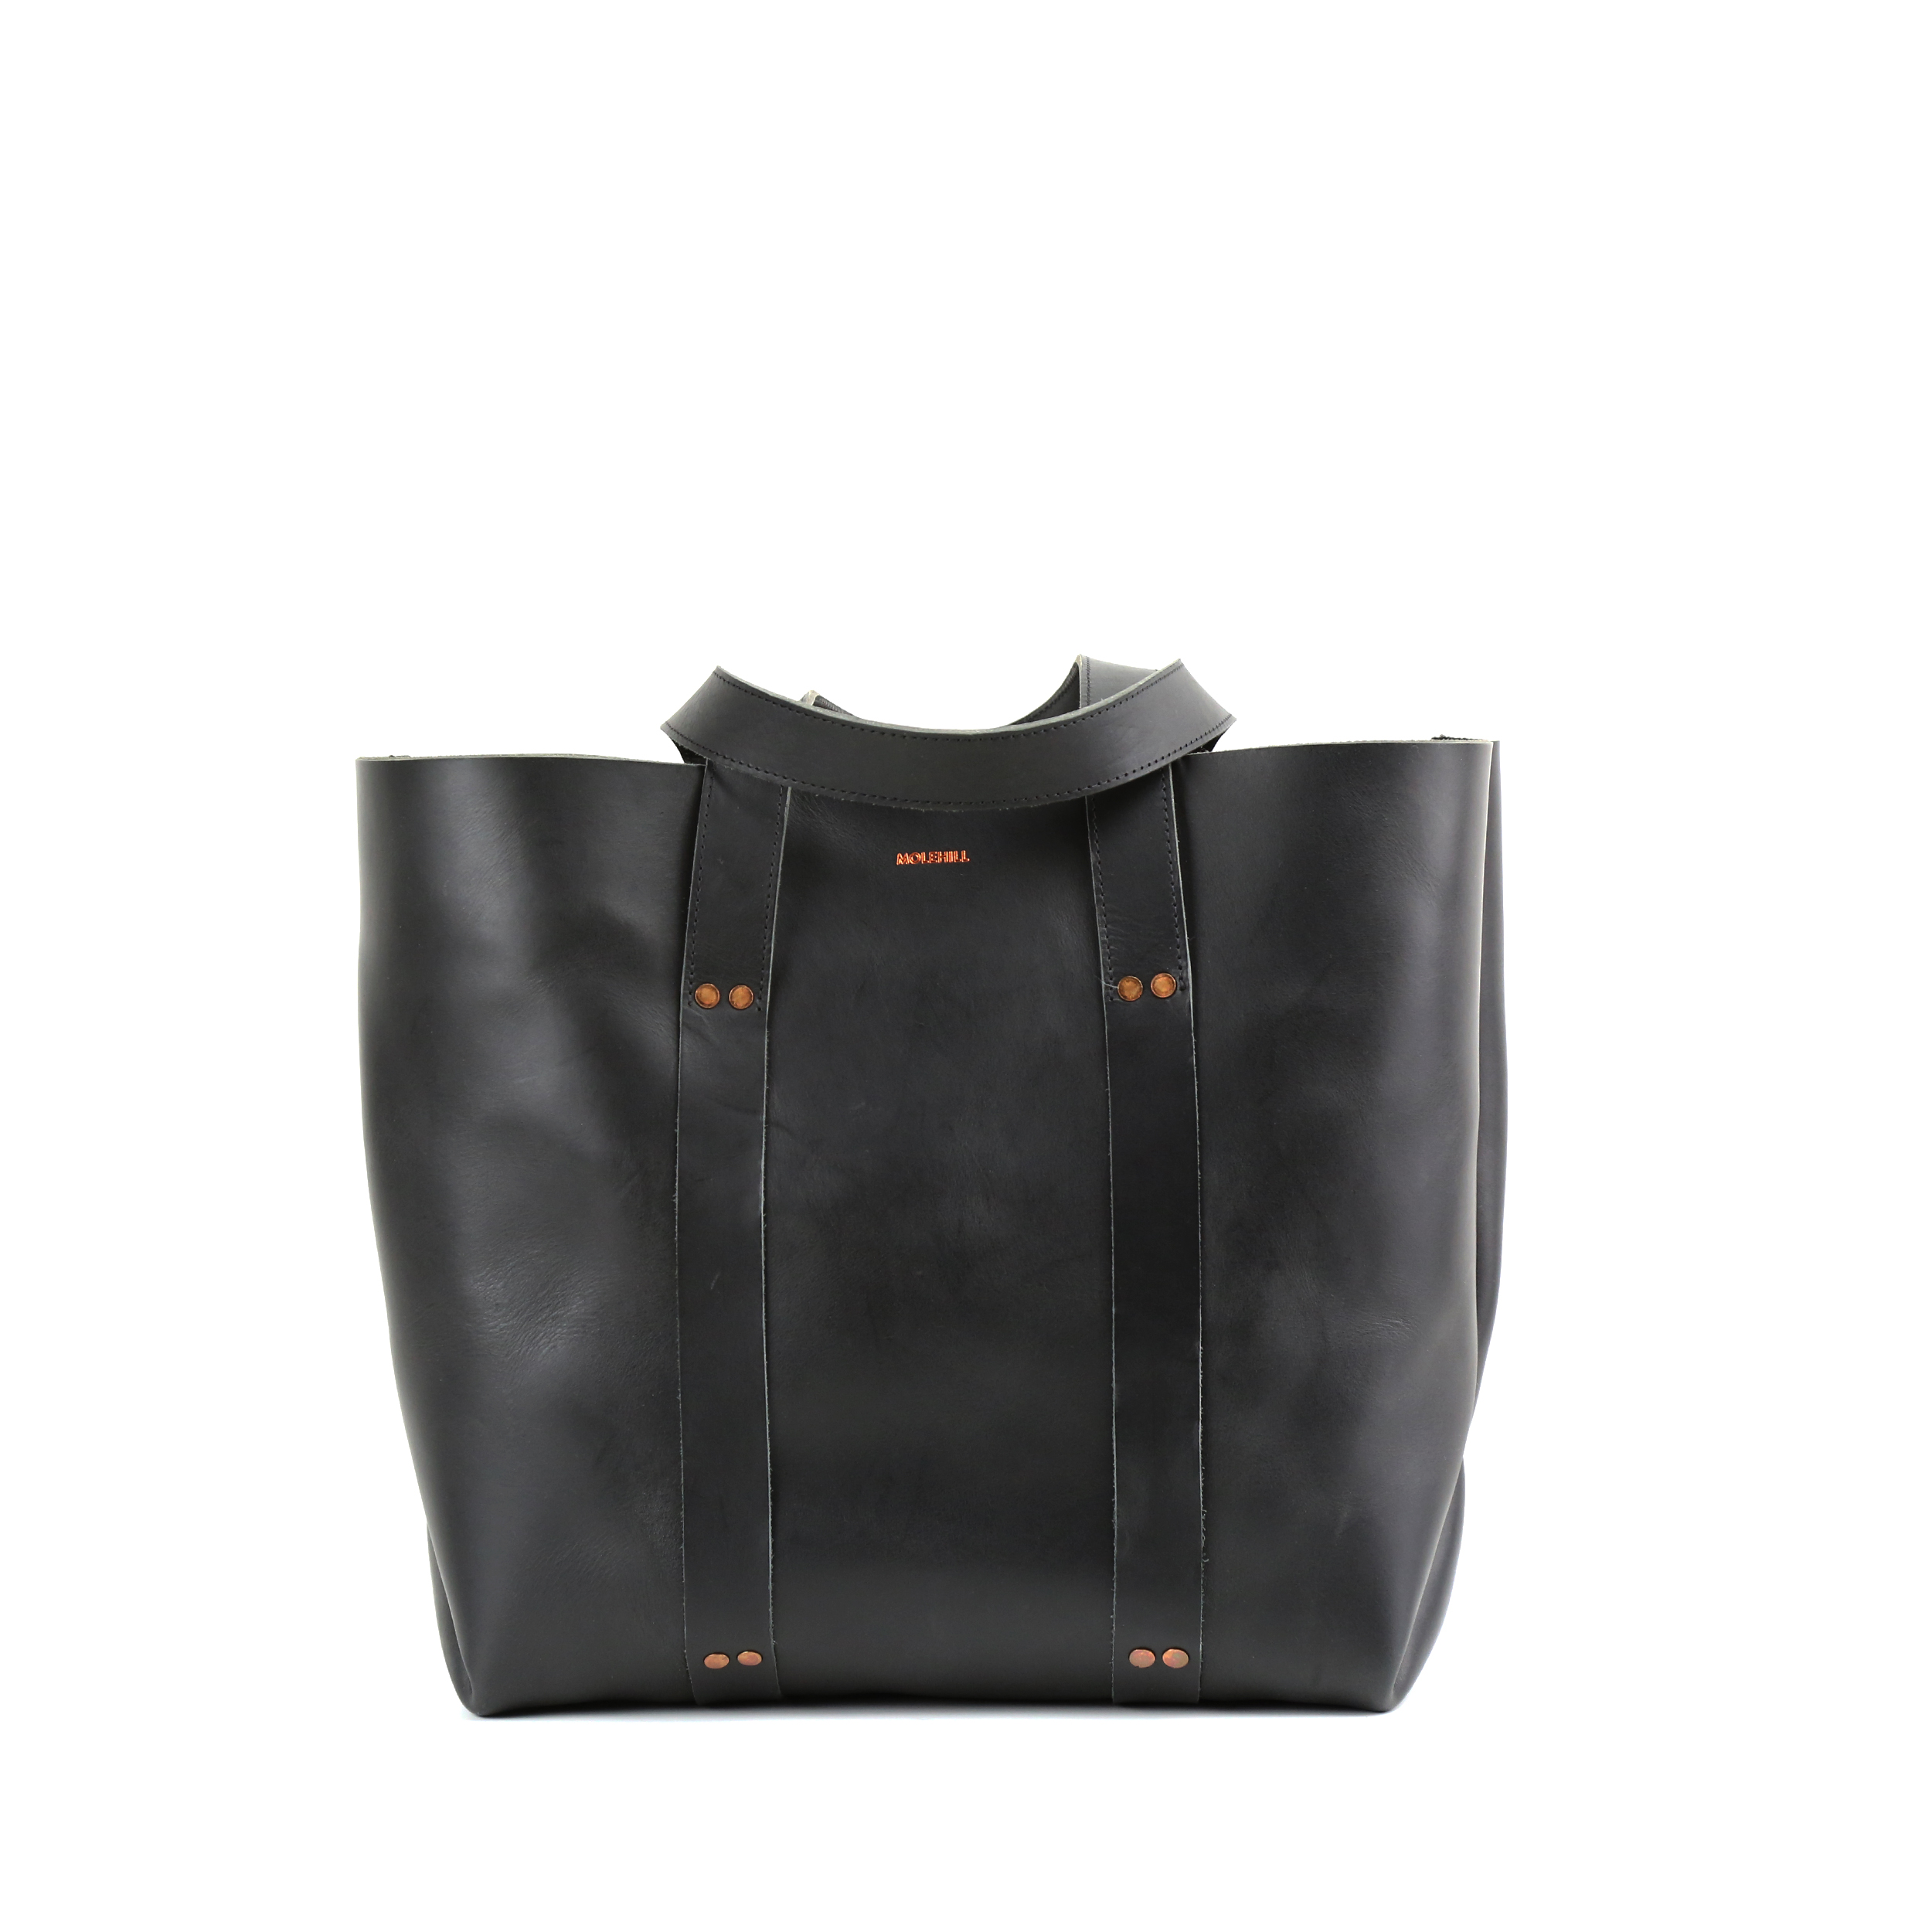 KRAFLA Shopper Black Sample Sale No. 1-2